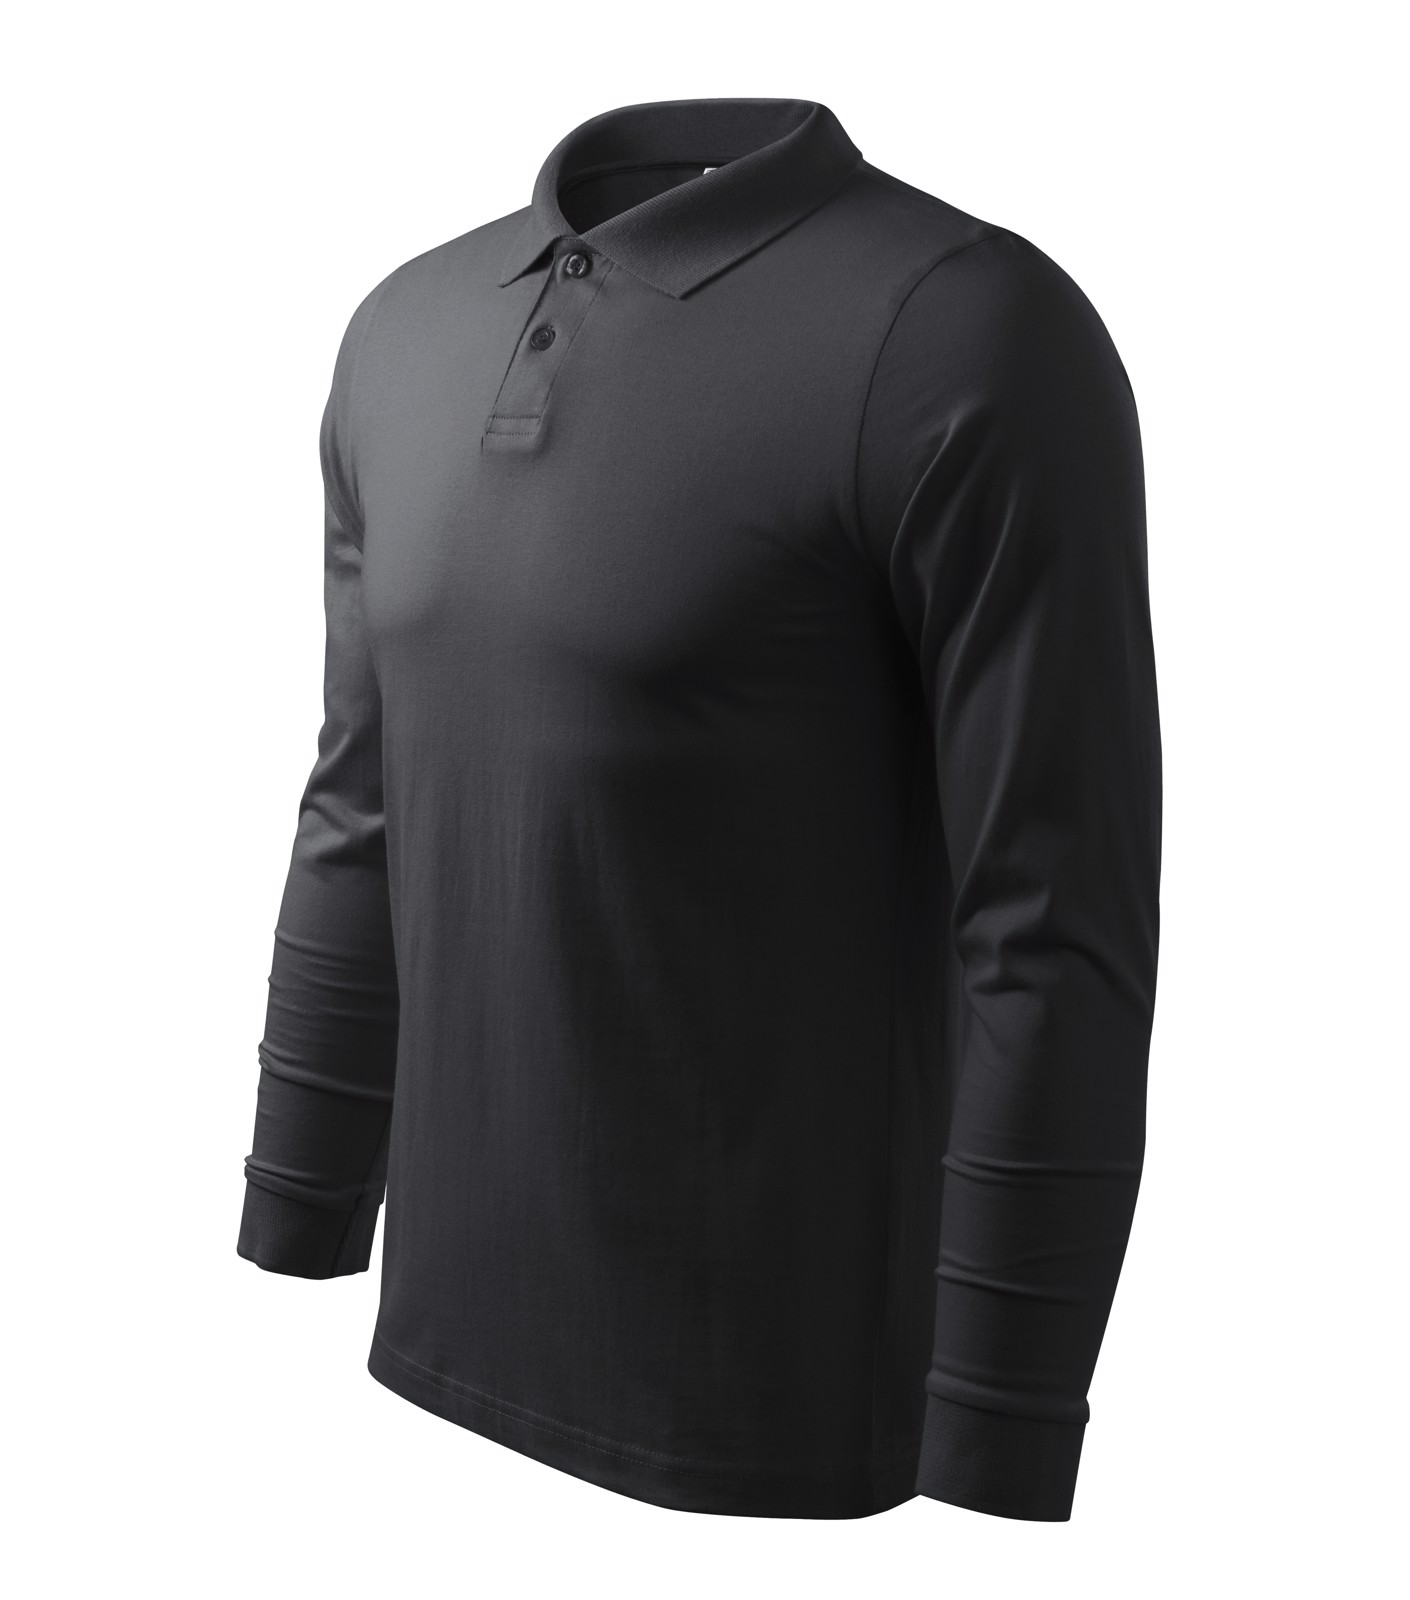 Polo Shirt men's Malfini Single J. LS - Ebony Gray / 2XL